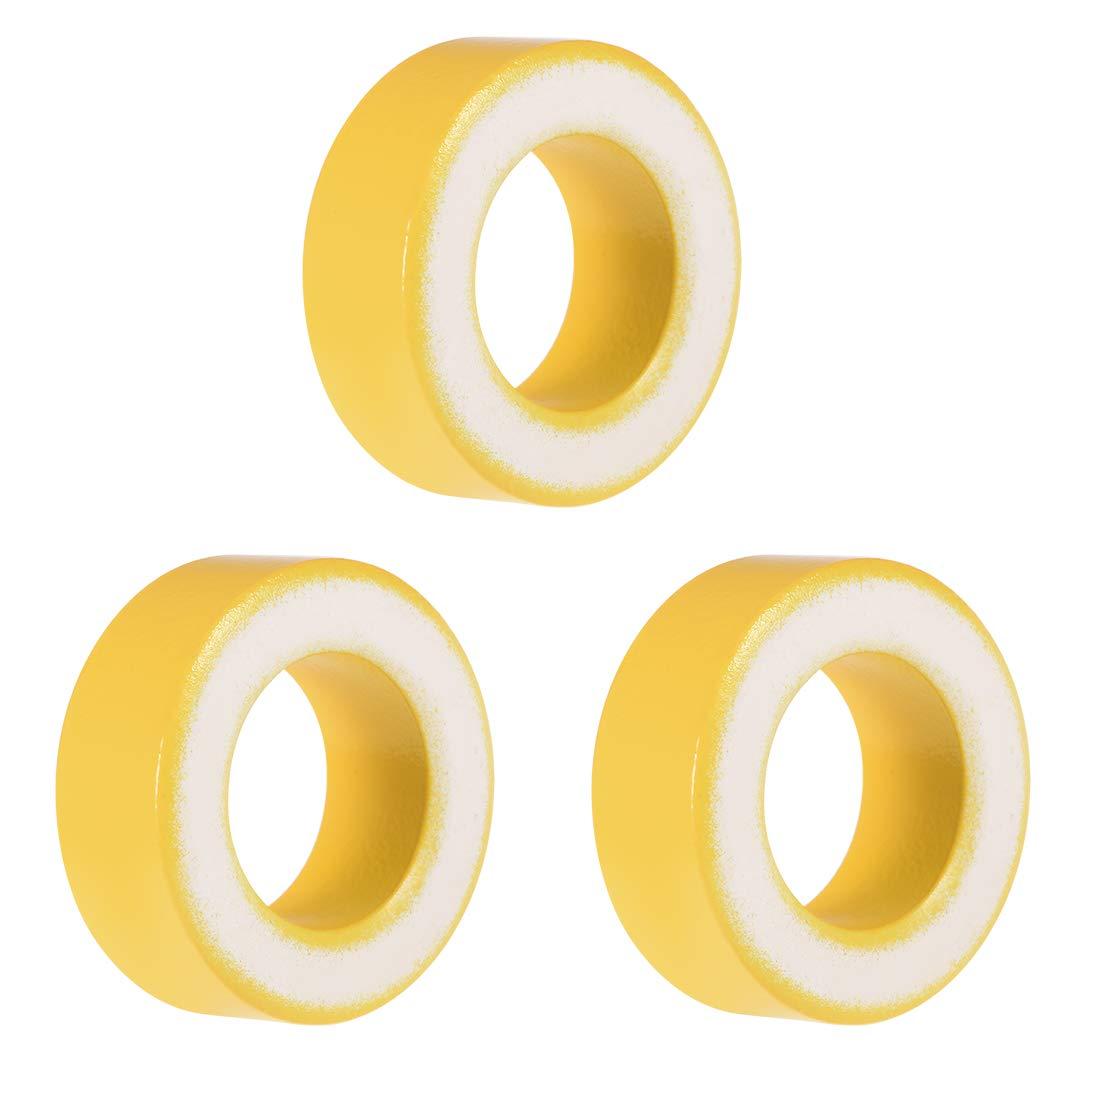 uxcell 3pcs 24 x 40.3 x 15mm Ferrite Ring Iron Powder Toroid Cores Yellow White